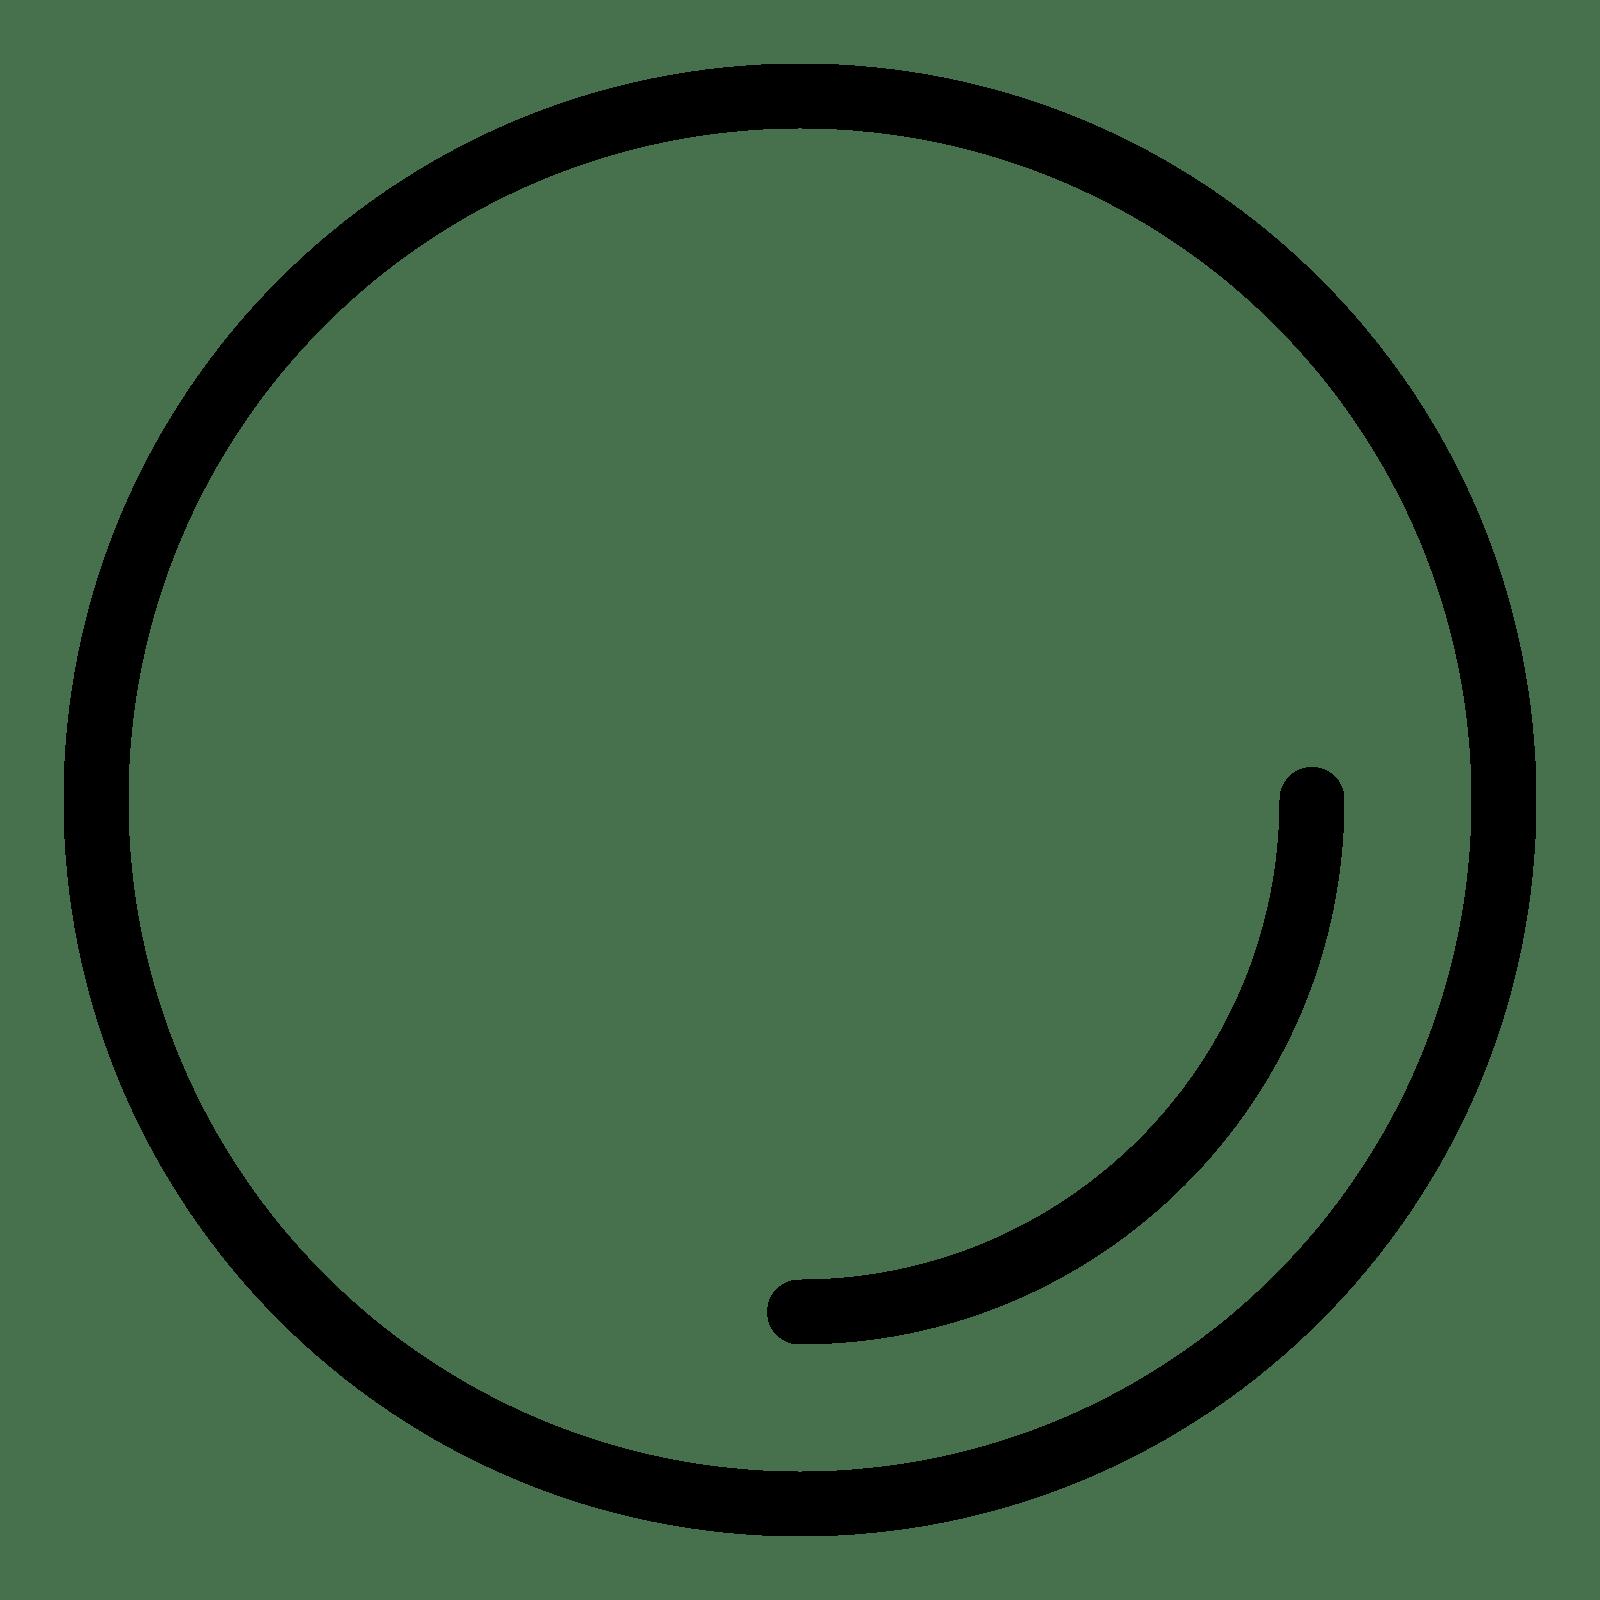 Windows 7 Start Button Icon Small | Wiring Diagram Database